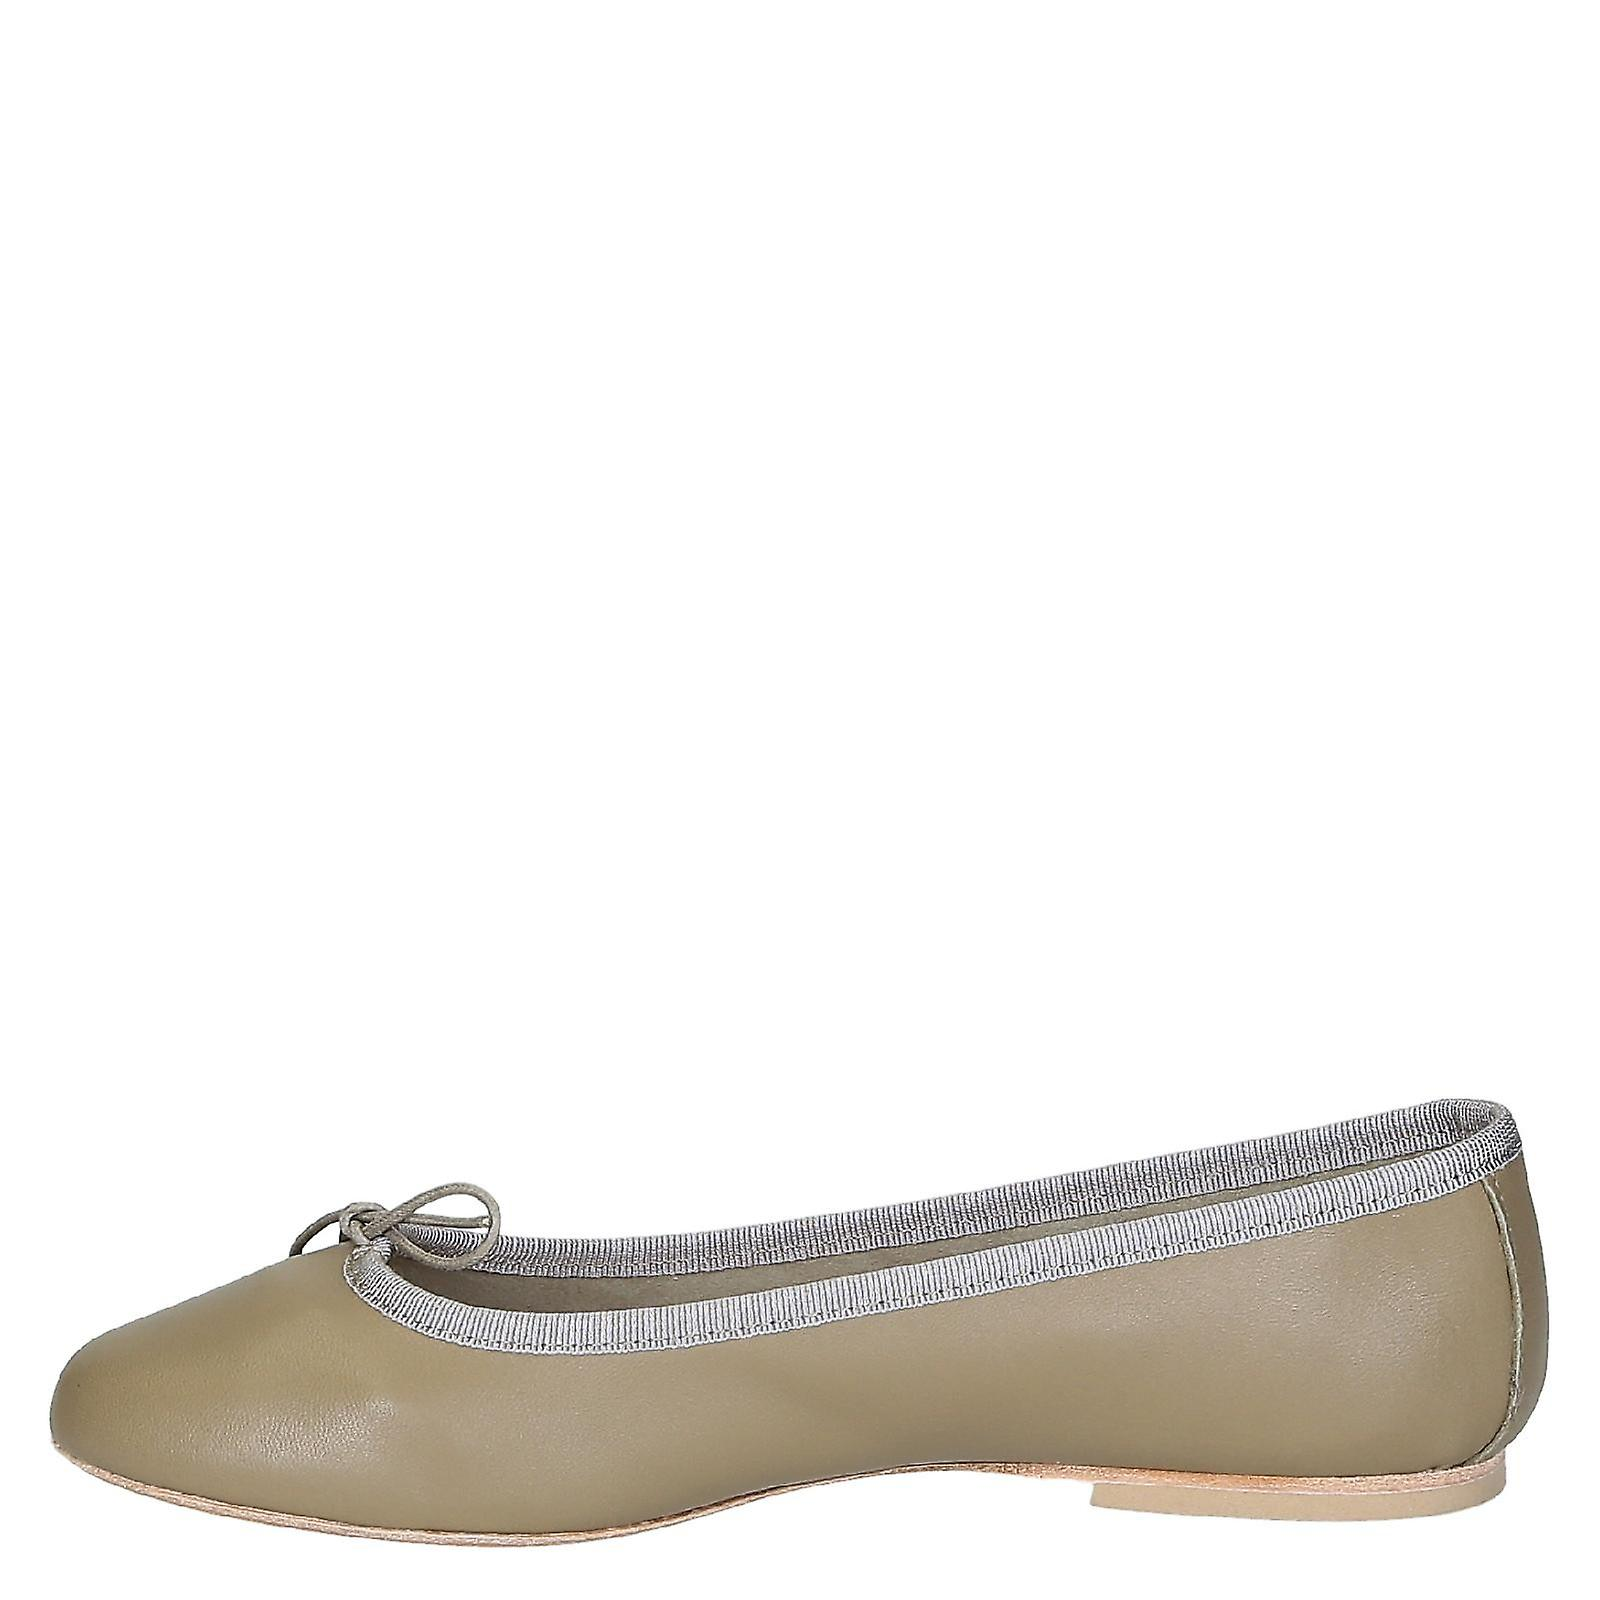 Beige soft leather ballet flats ballerinas shoes